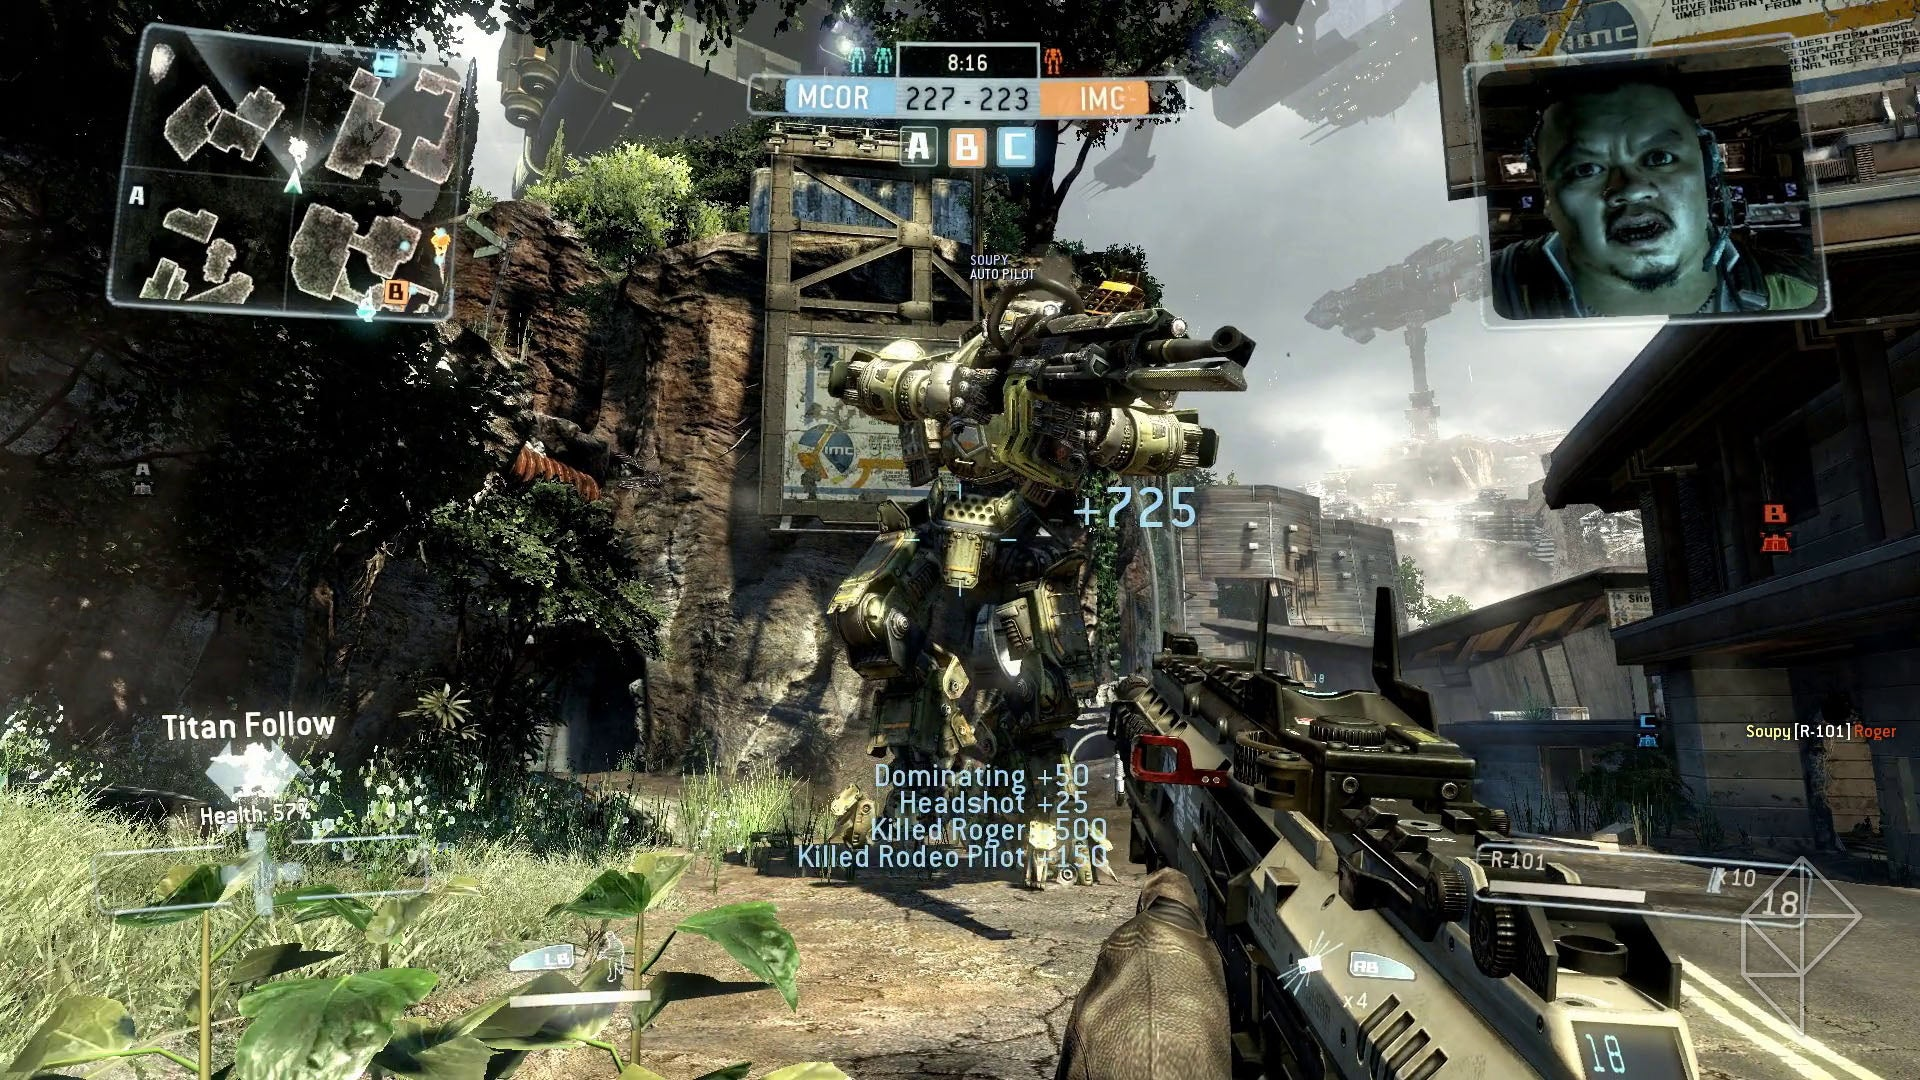 Capa Titanfall 2 anunciado oficialmente e DLC's gratuitos.